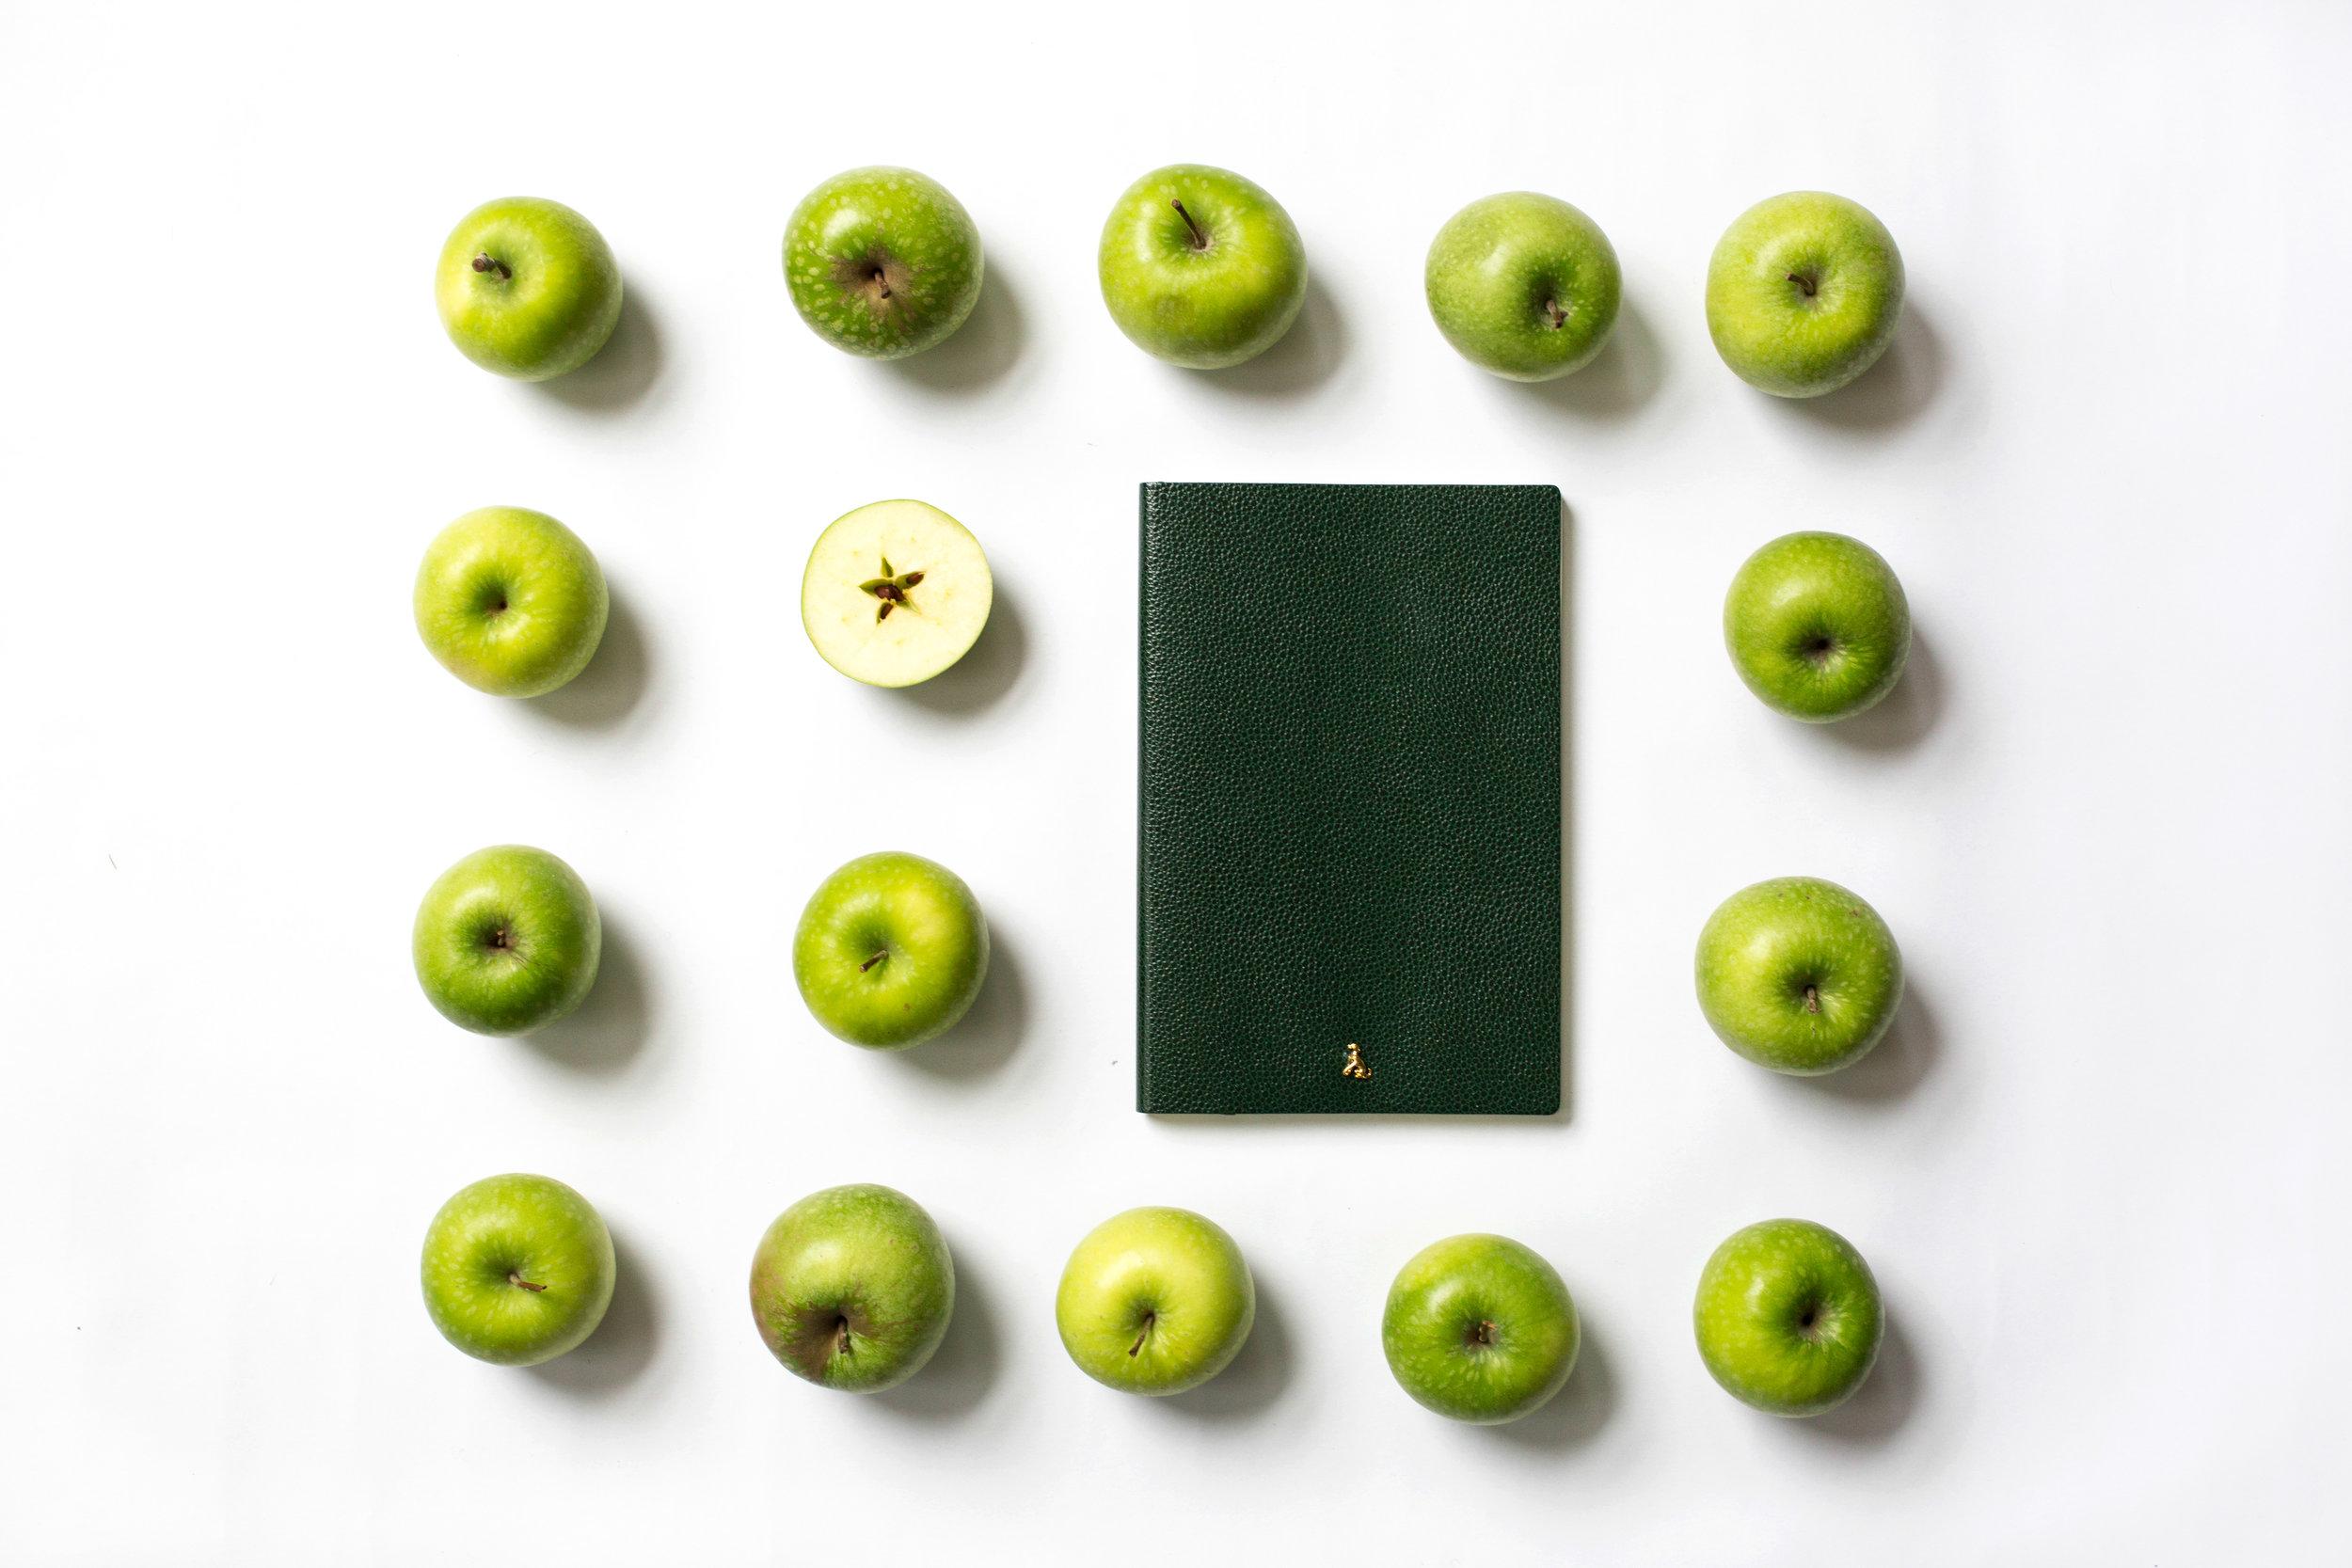 Rollo London Notebooks, Desk Jotters, Desk Mats, Coasters